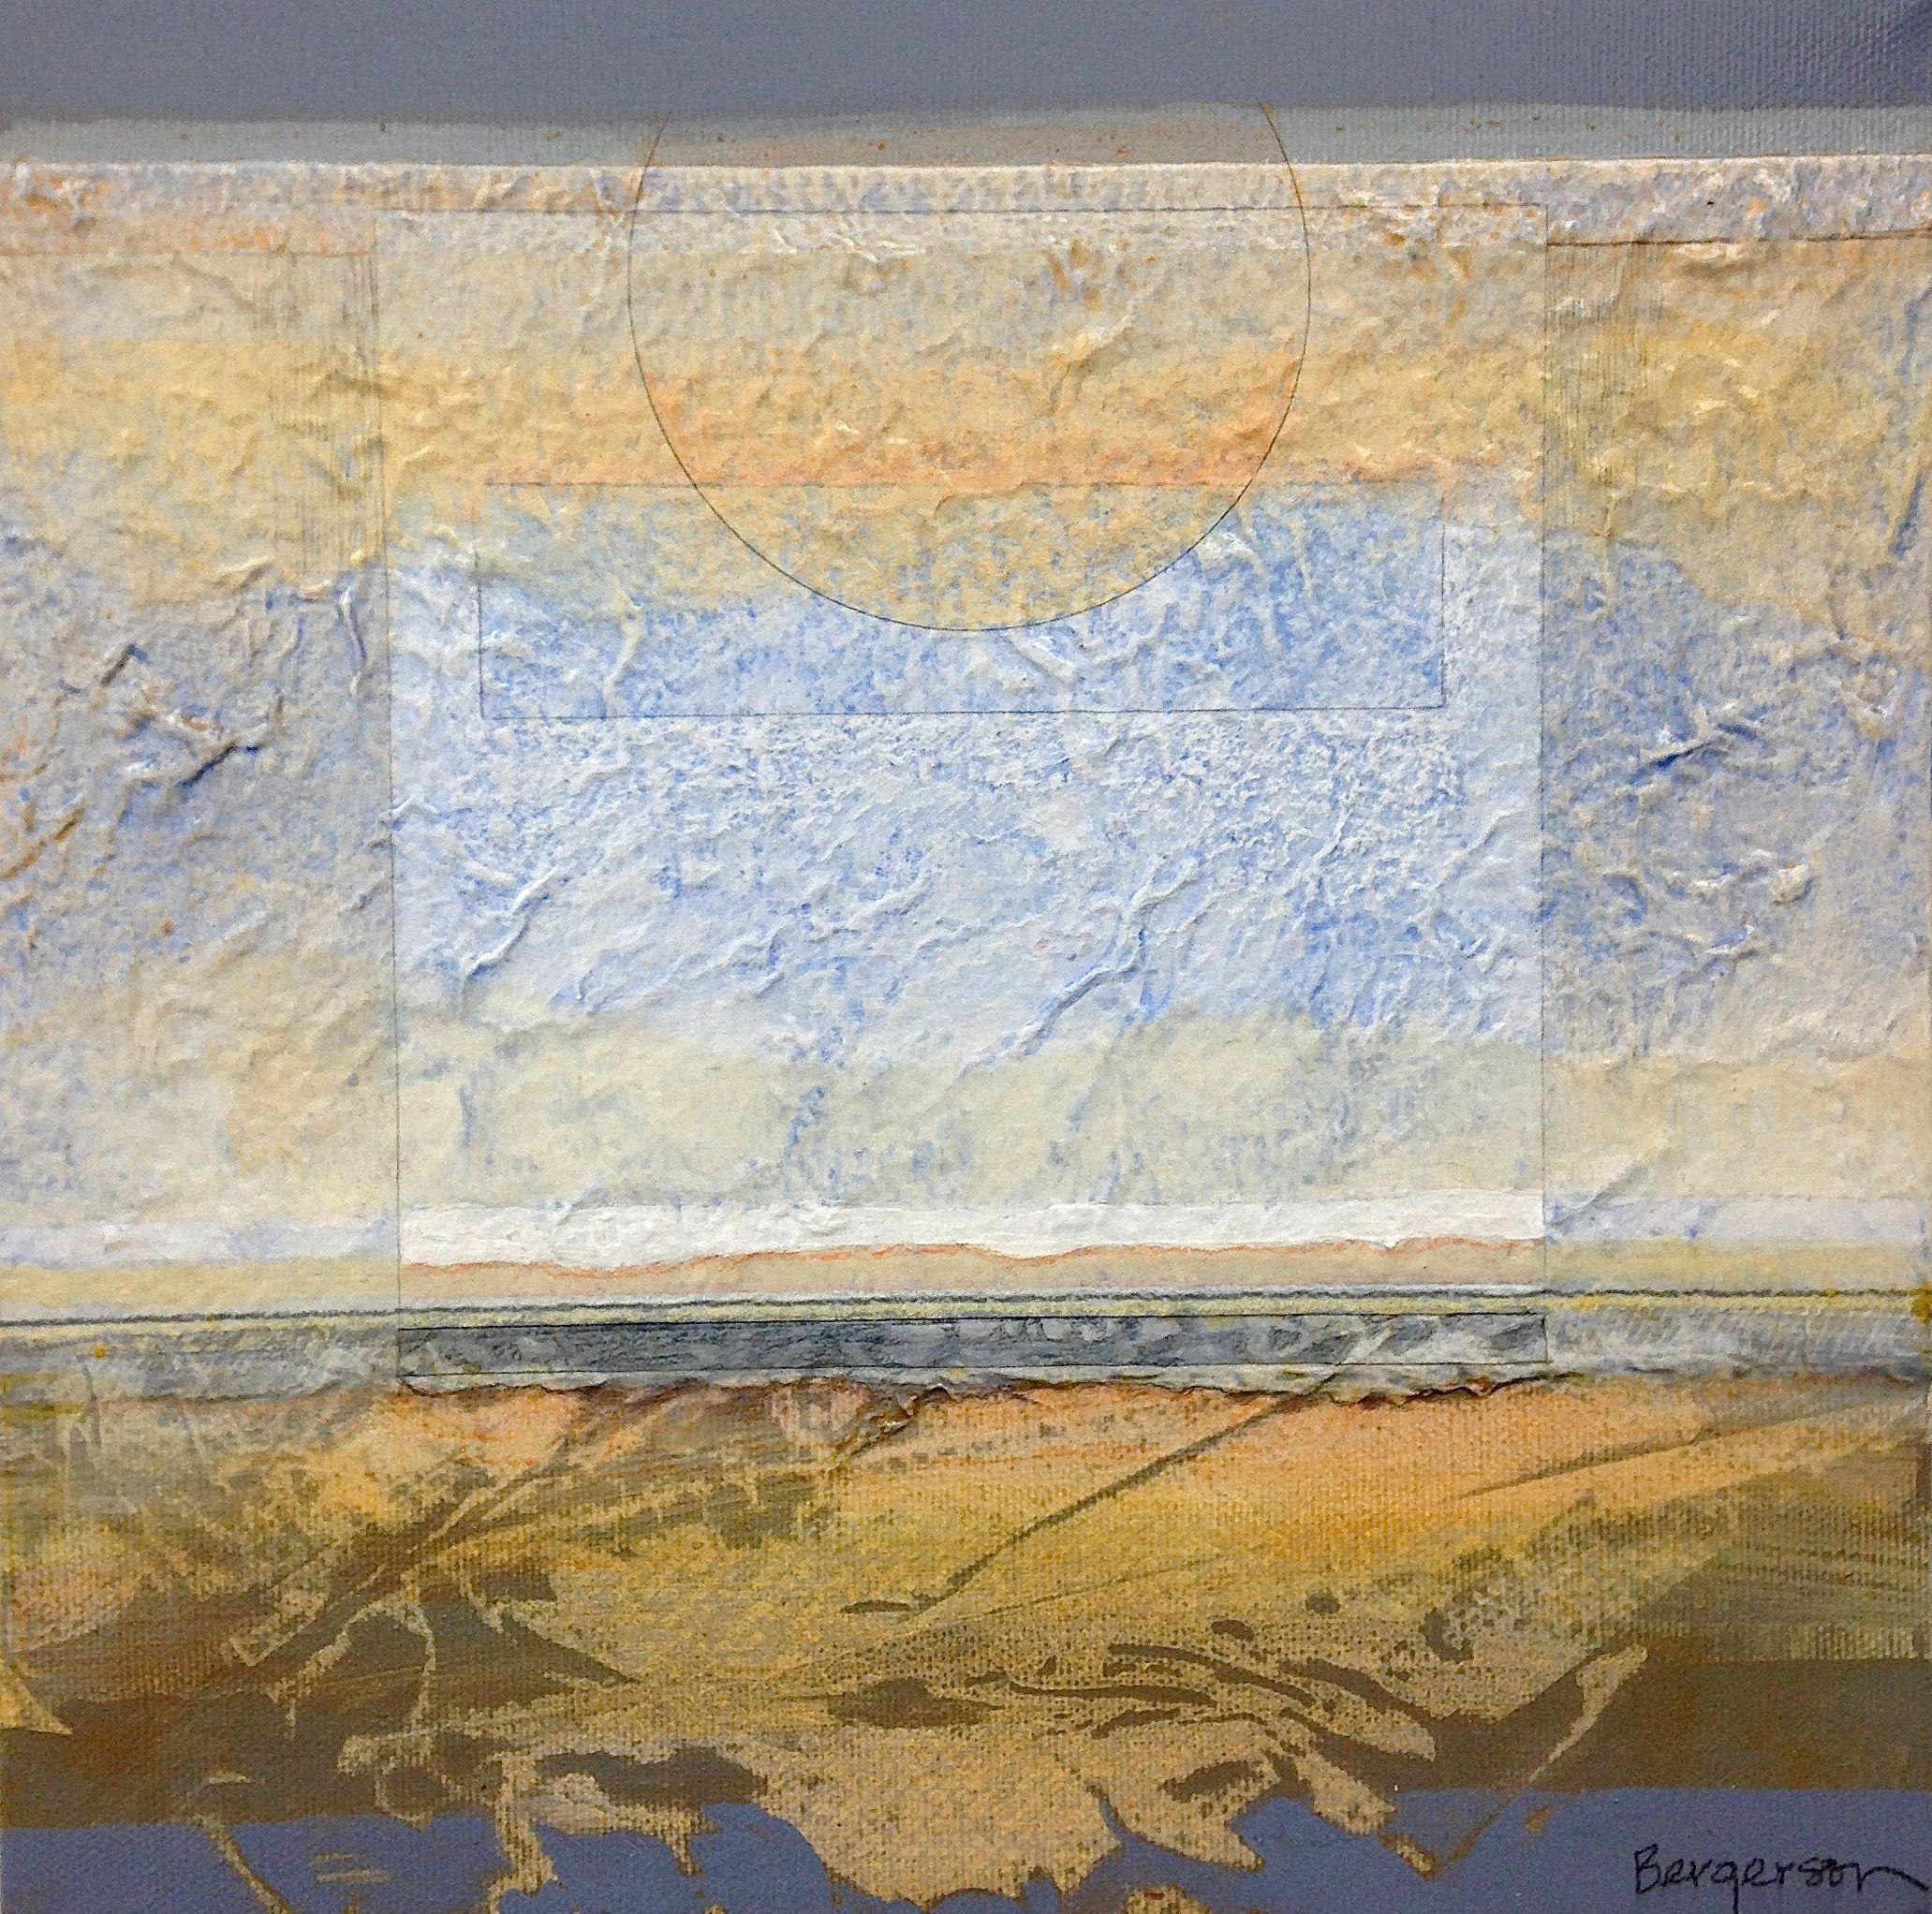 WinterSun4 By Judith Bergerson